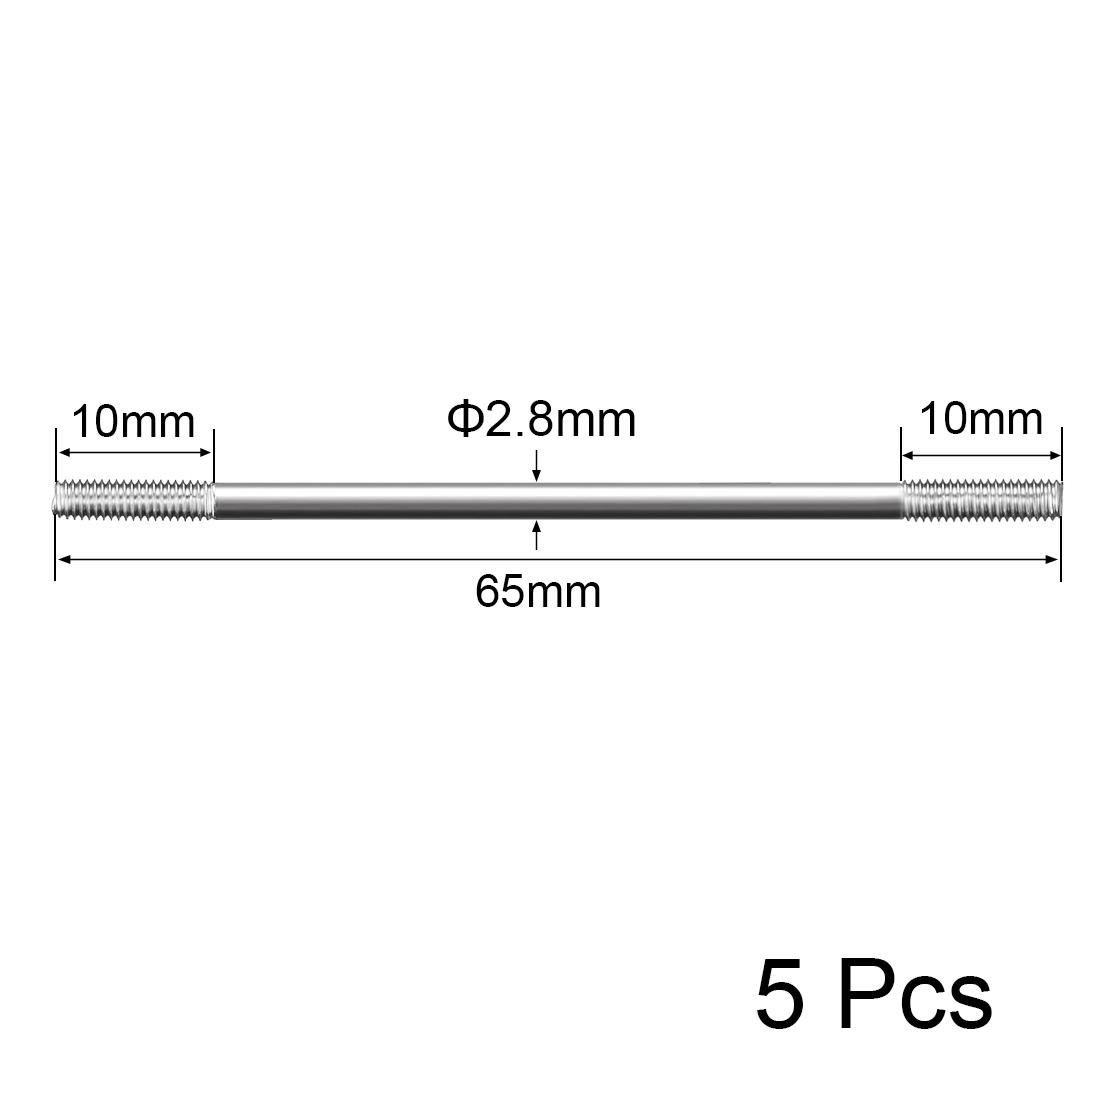 M3x65mm Pushrod Connector Stainless Steel Rod Linkage,5pcs - image 2 de 4